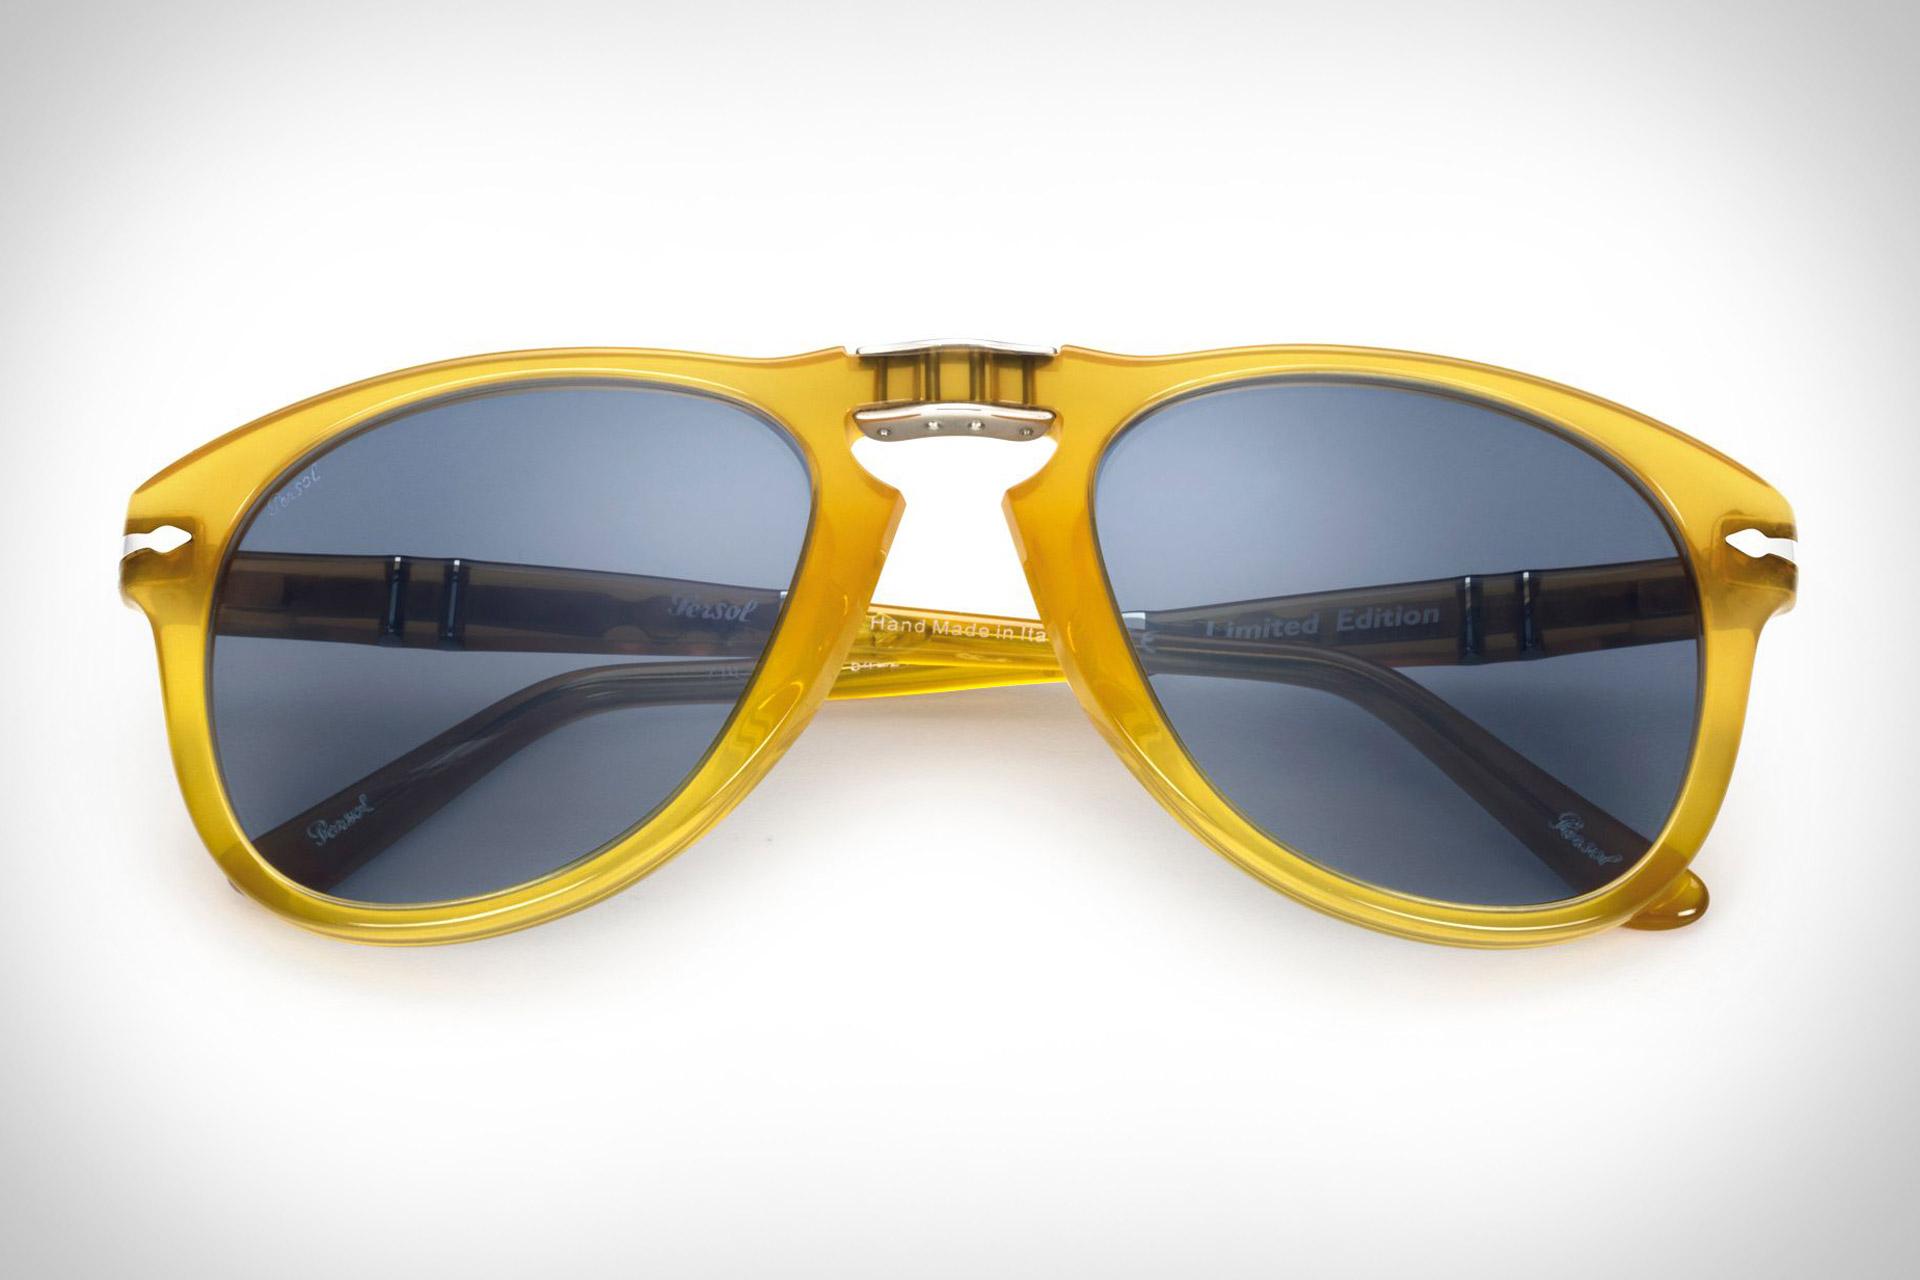 e14b6daac8577 Persol 714 Limited Edition Sunglasses